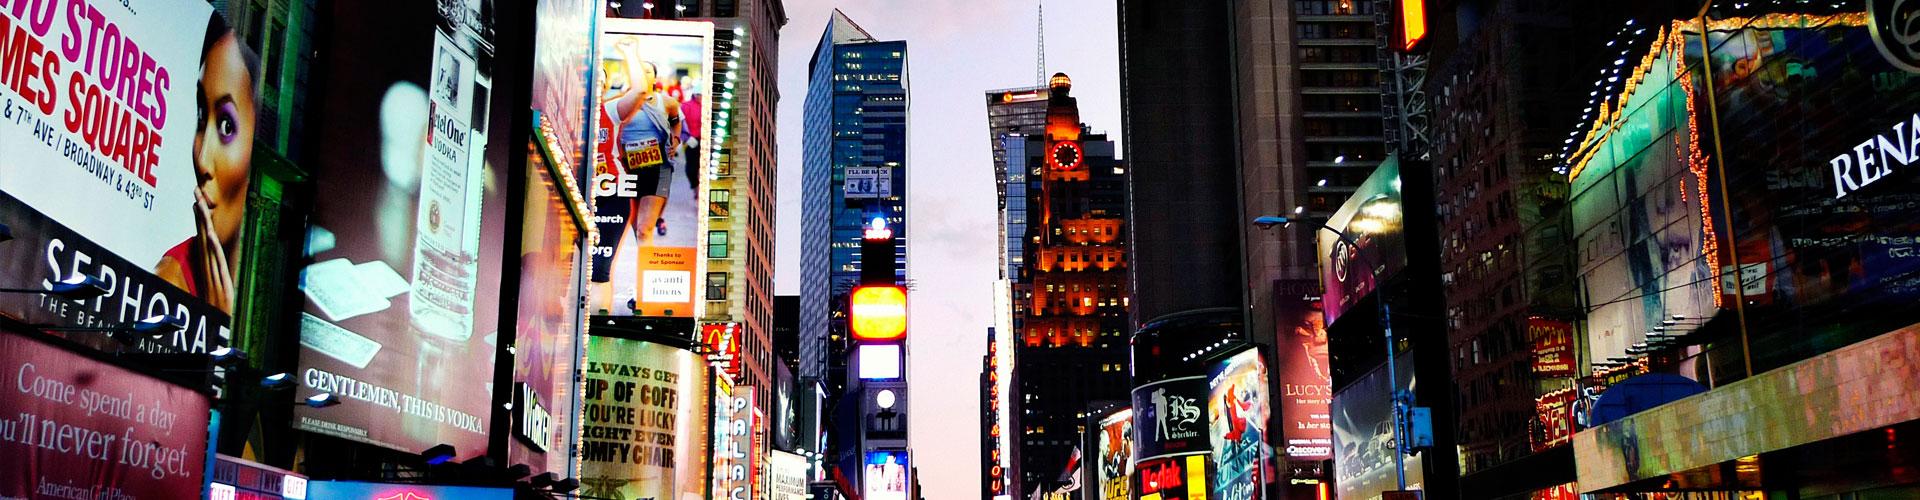 Building 92 microsoft store - New York